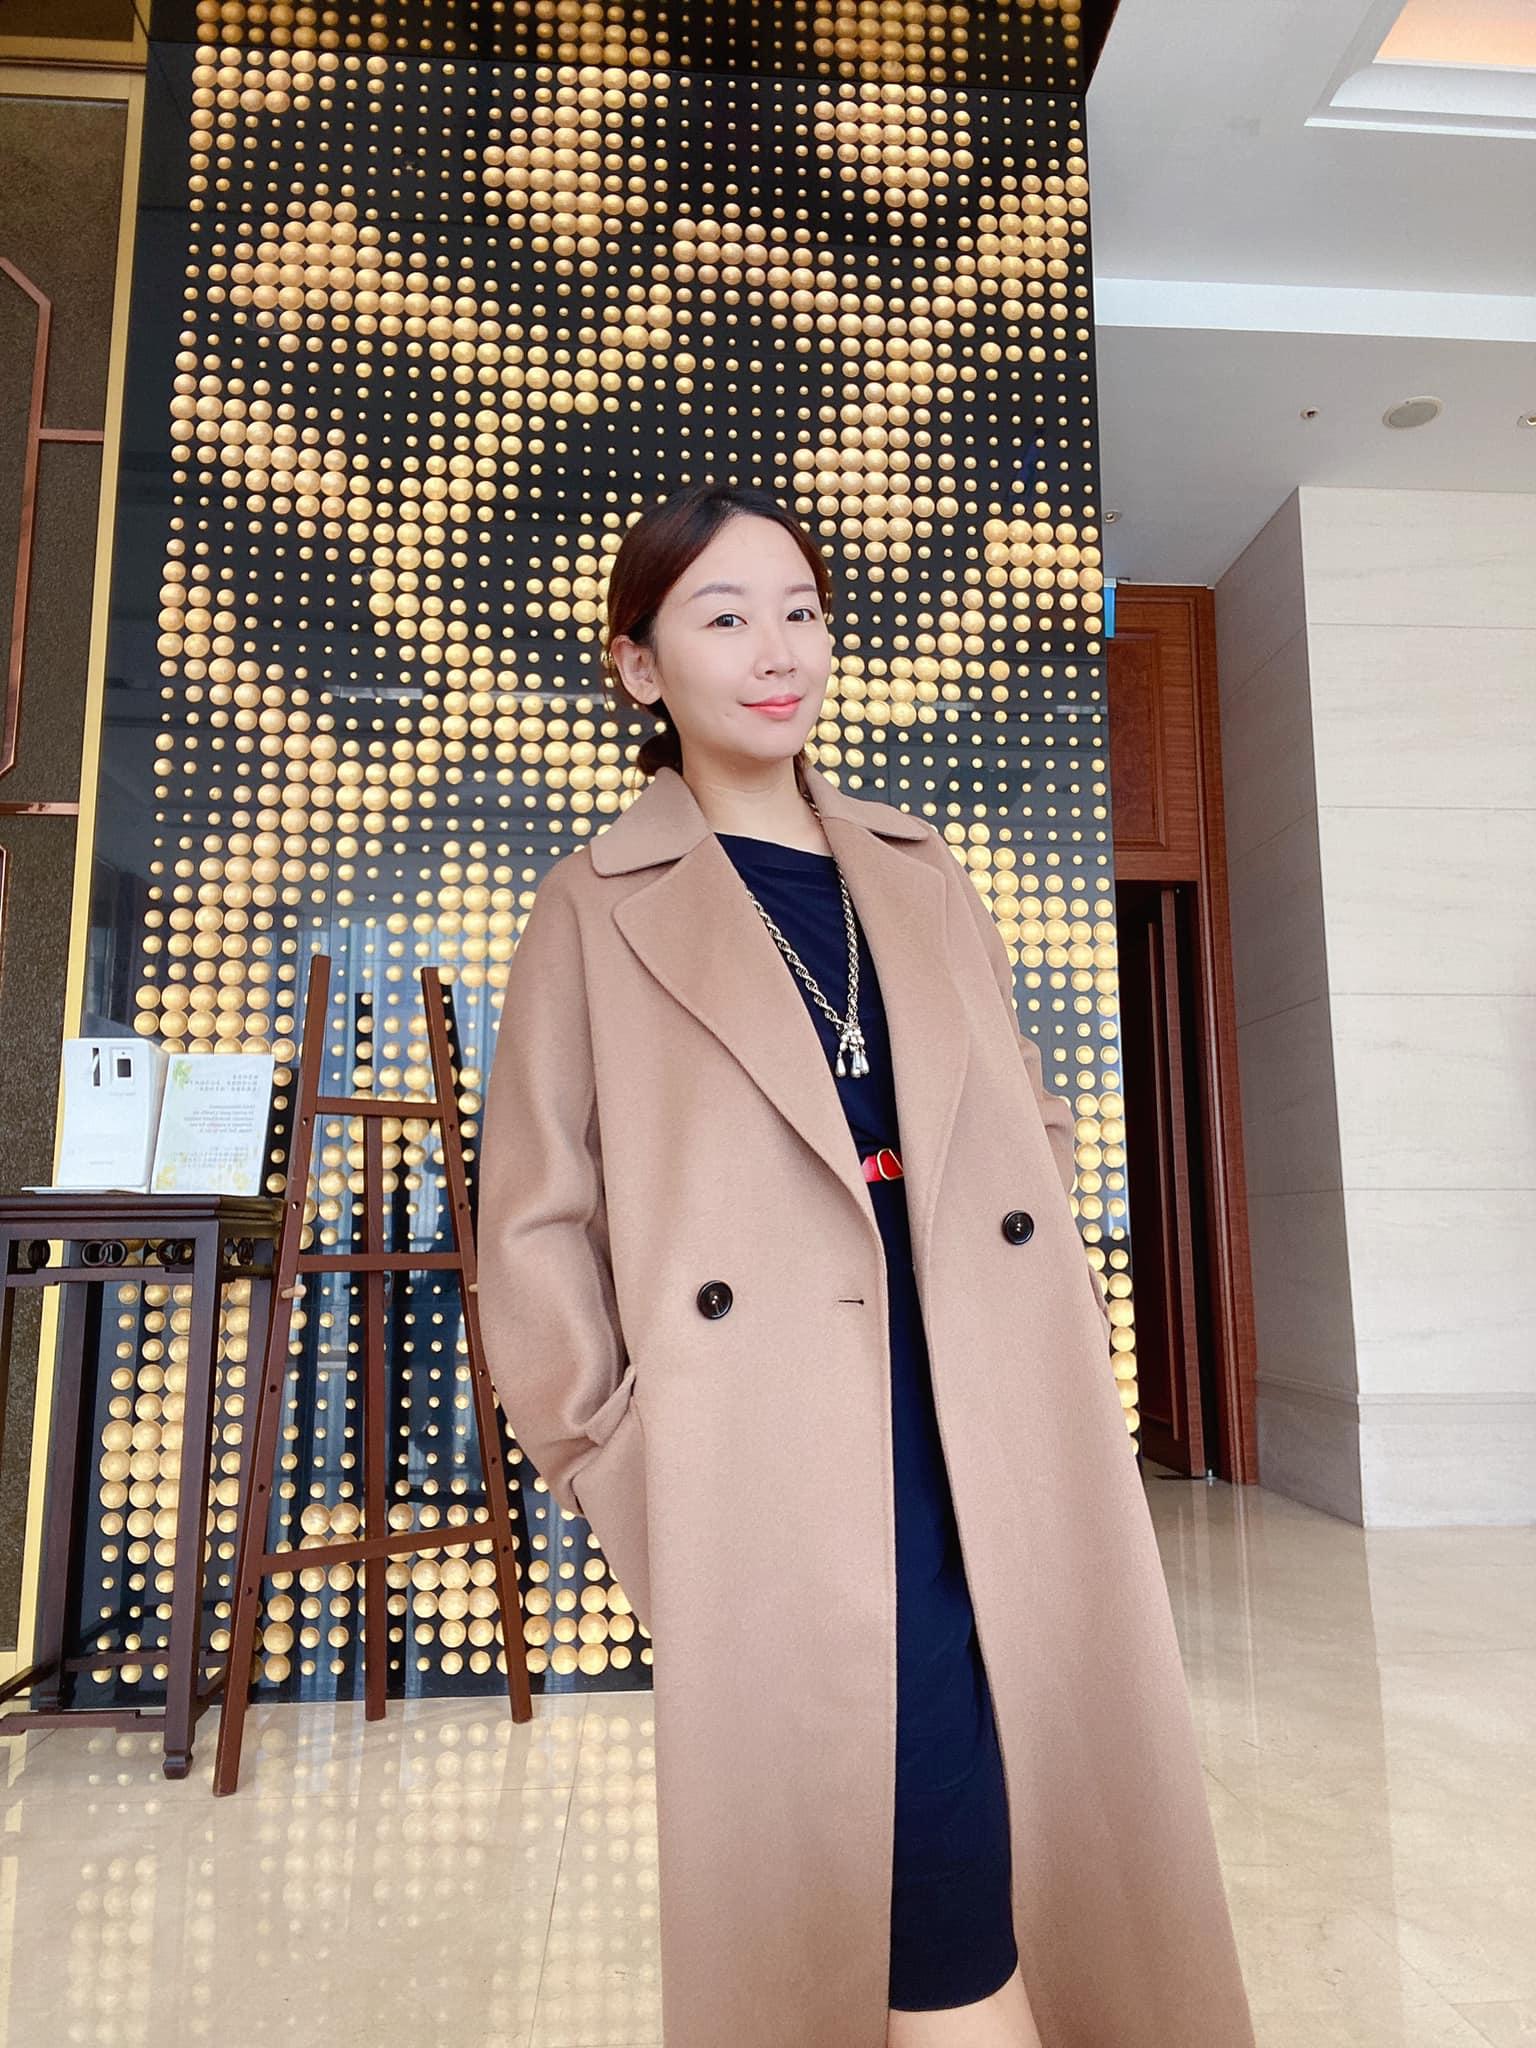 Mytheresa 折上八折,MAXA MARA 大衣可以最低6折+額外8折的好價格